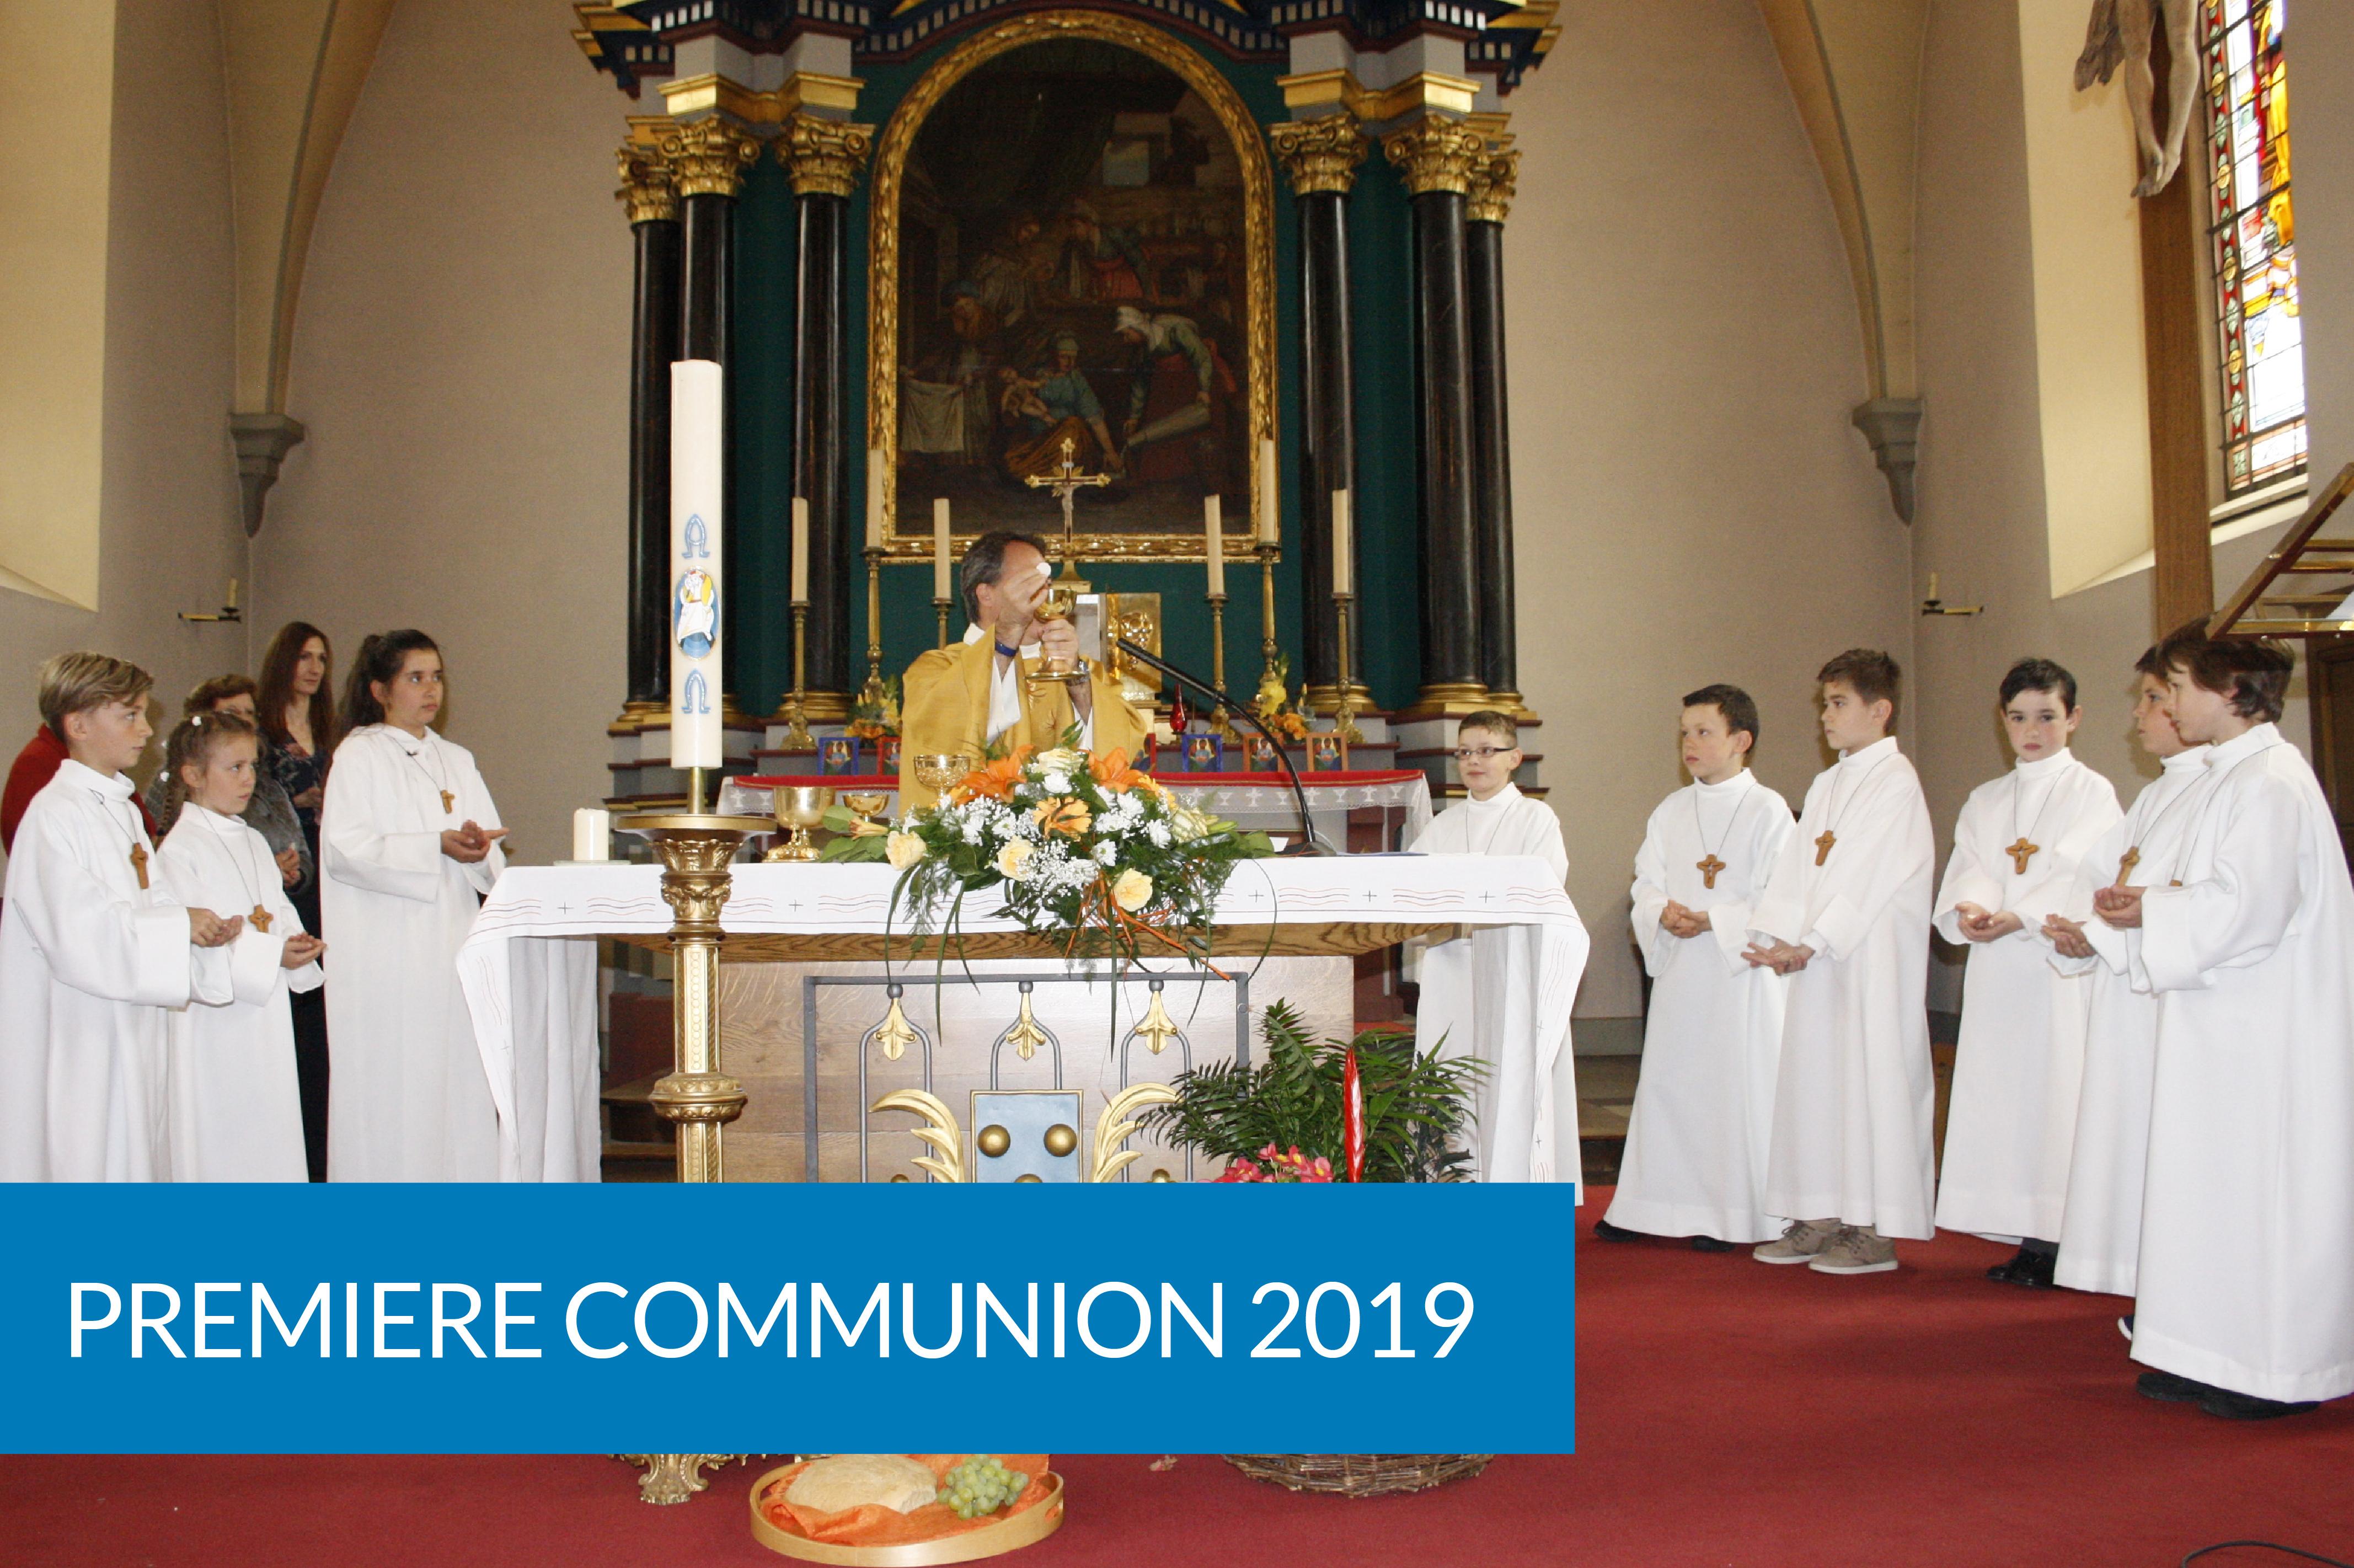 premierecommunion2016-01